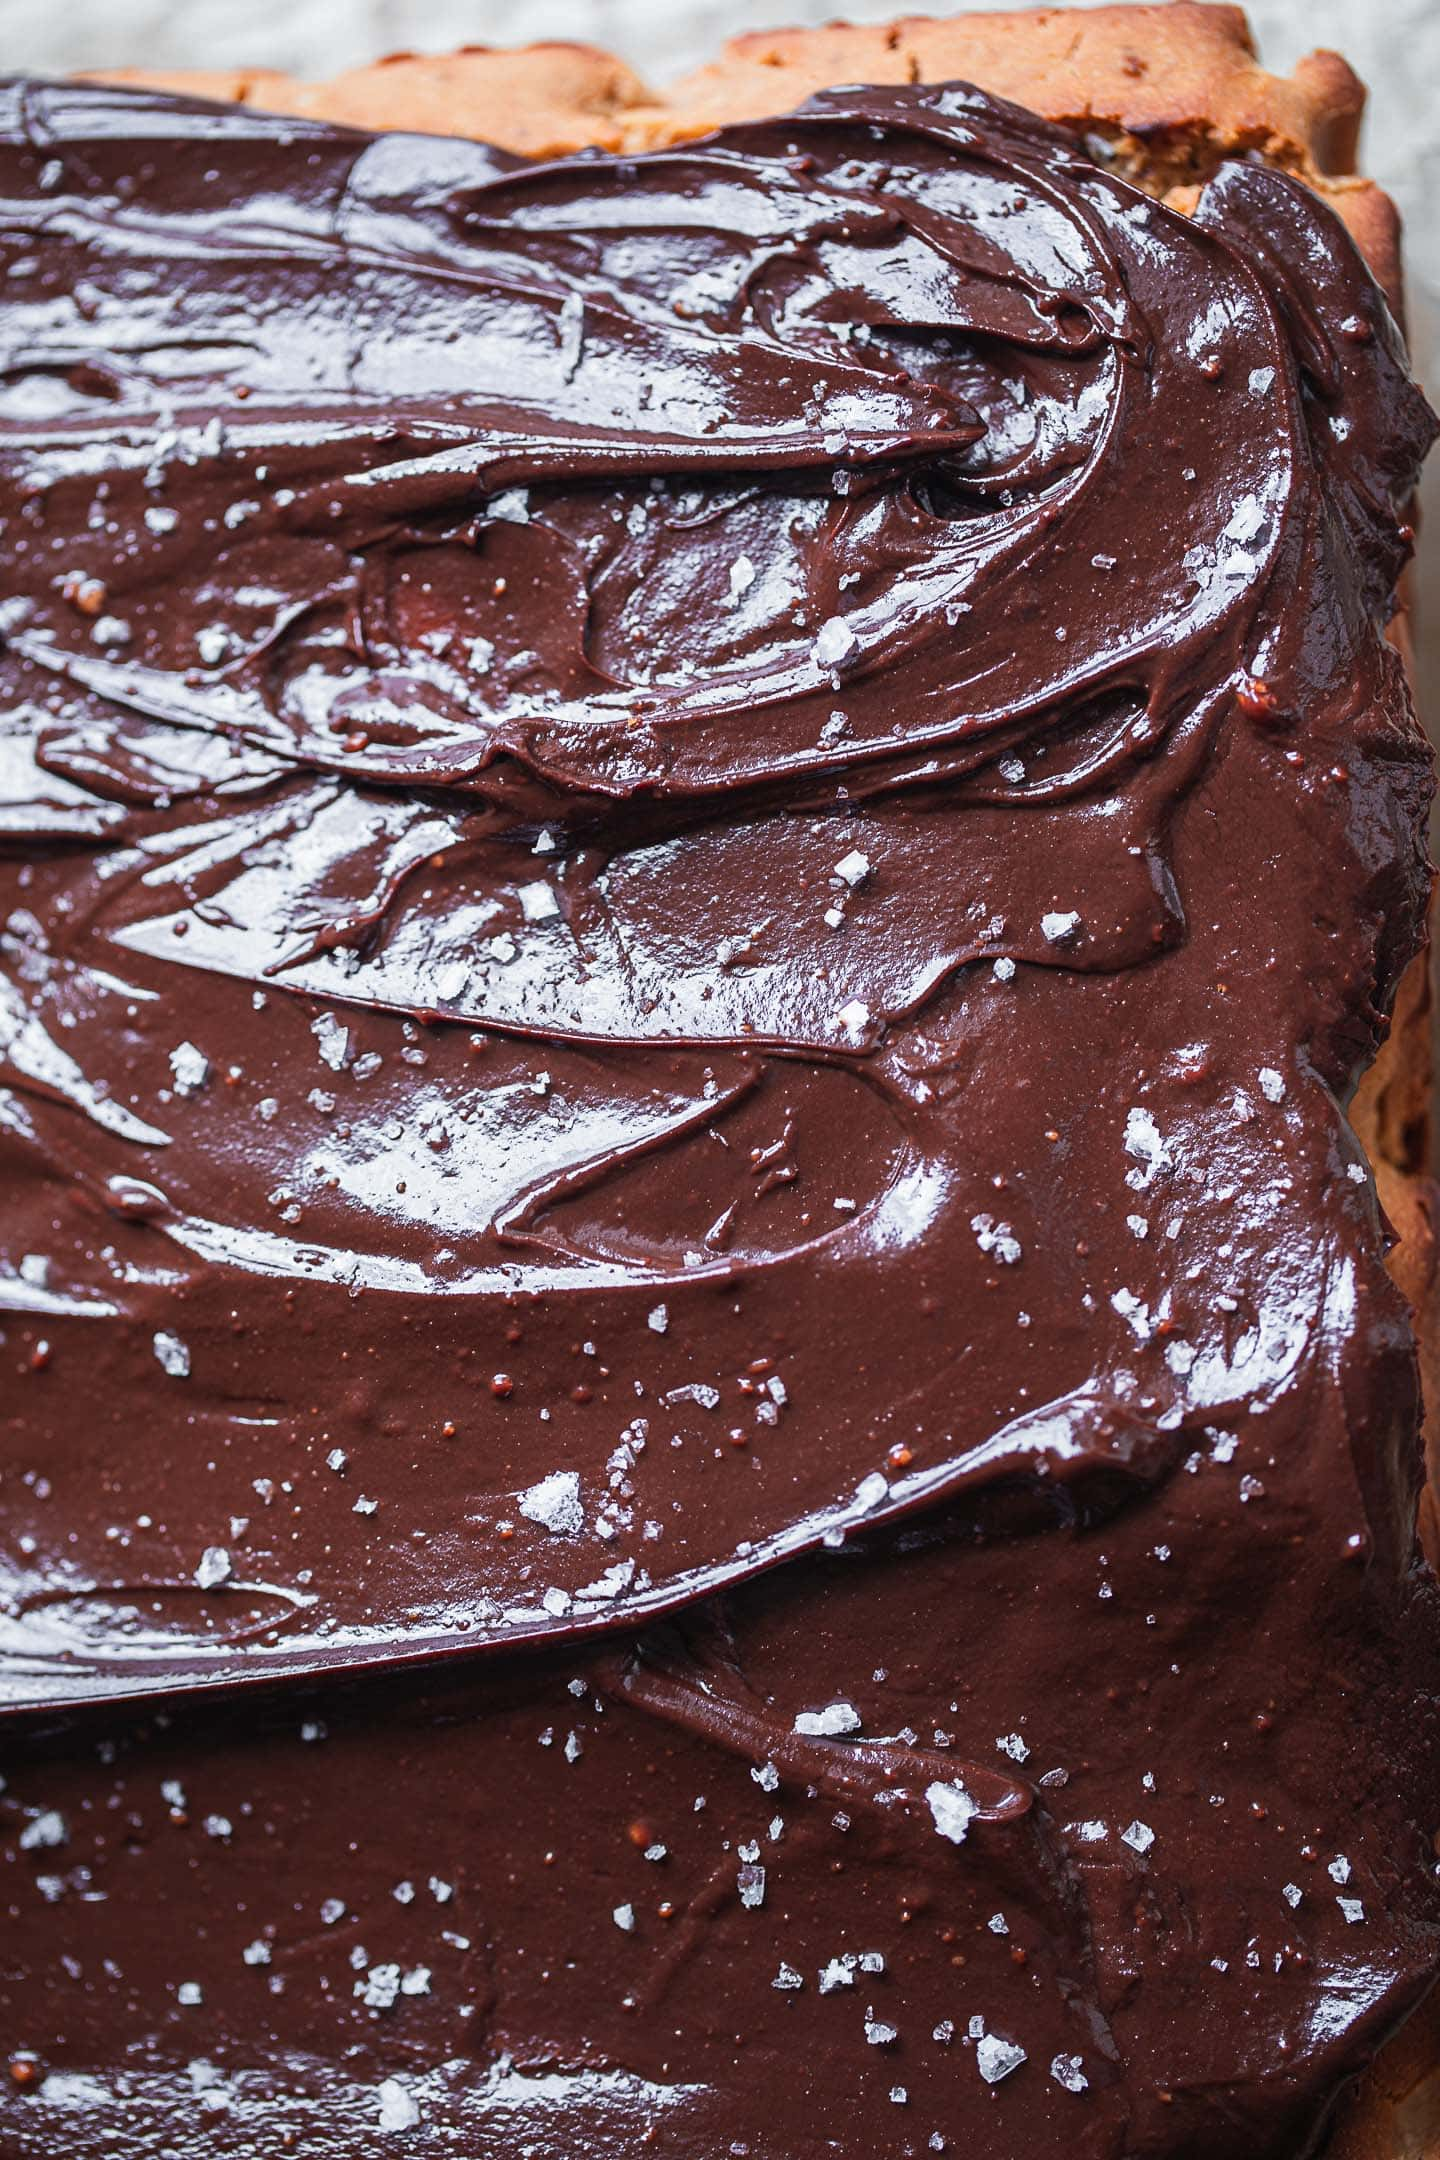 Closeup of a vegan cake with chocolate glaze